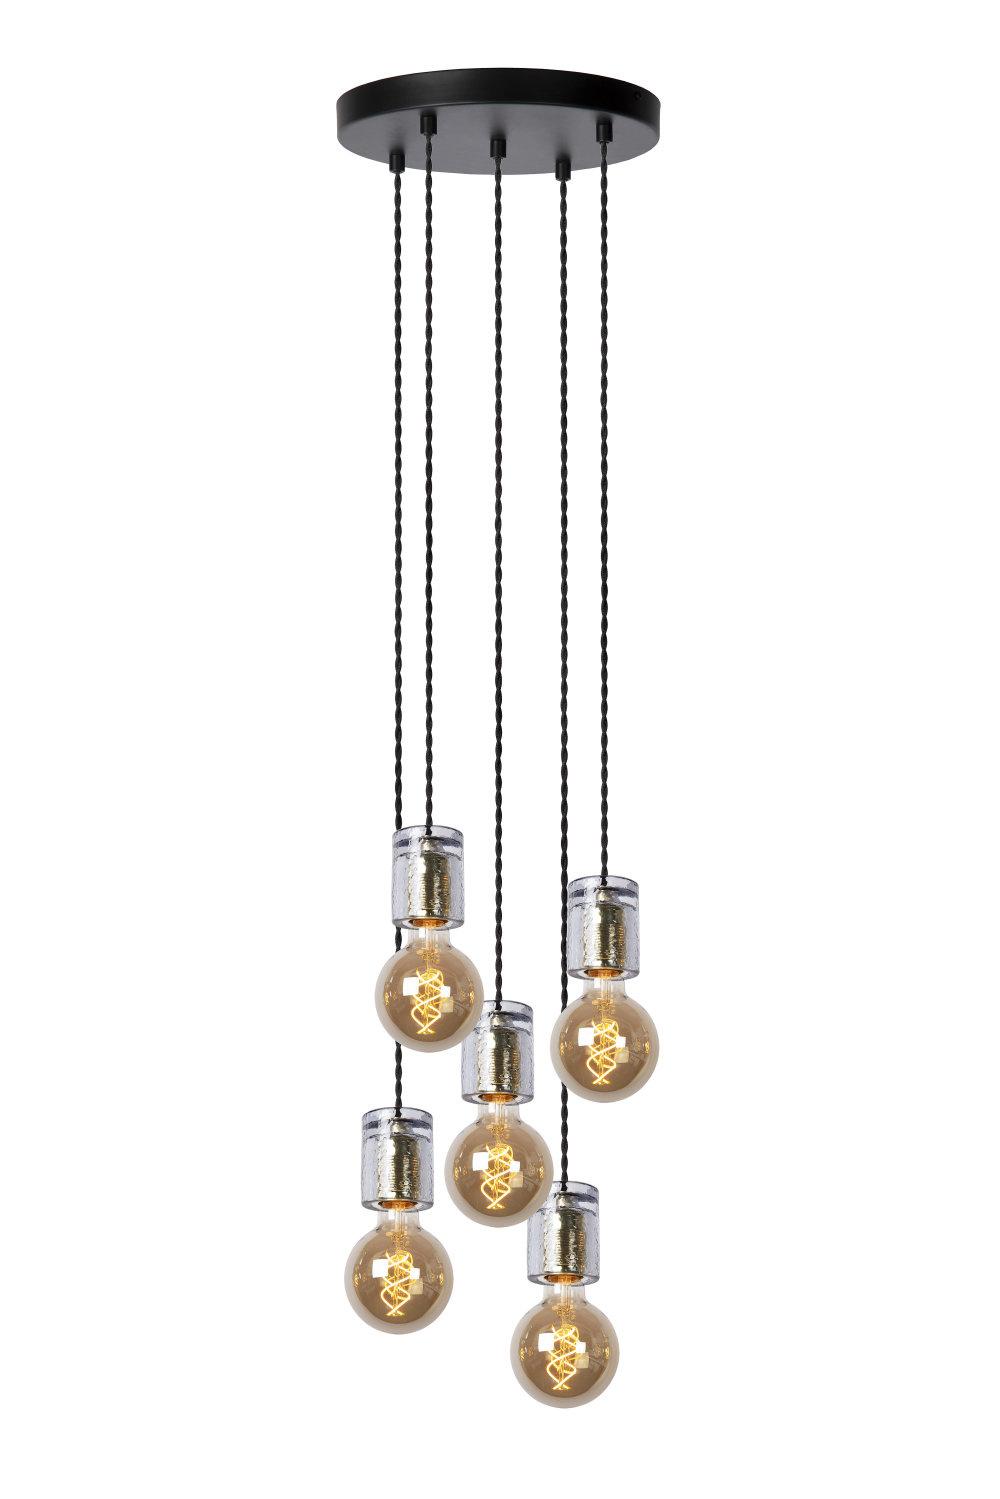 Lucide GELKA Hanglamp-Fumé-Ø30-5xE27-40W-Glas